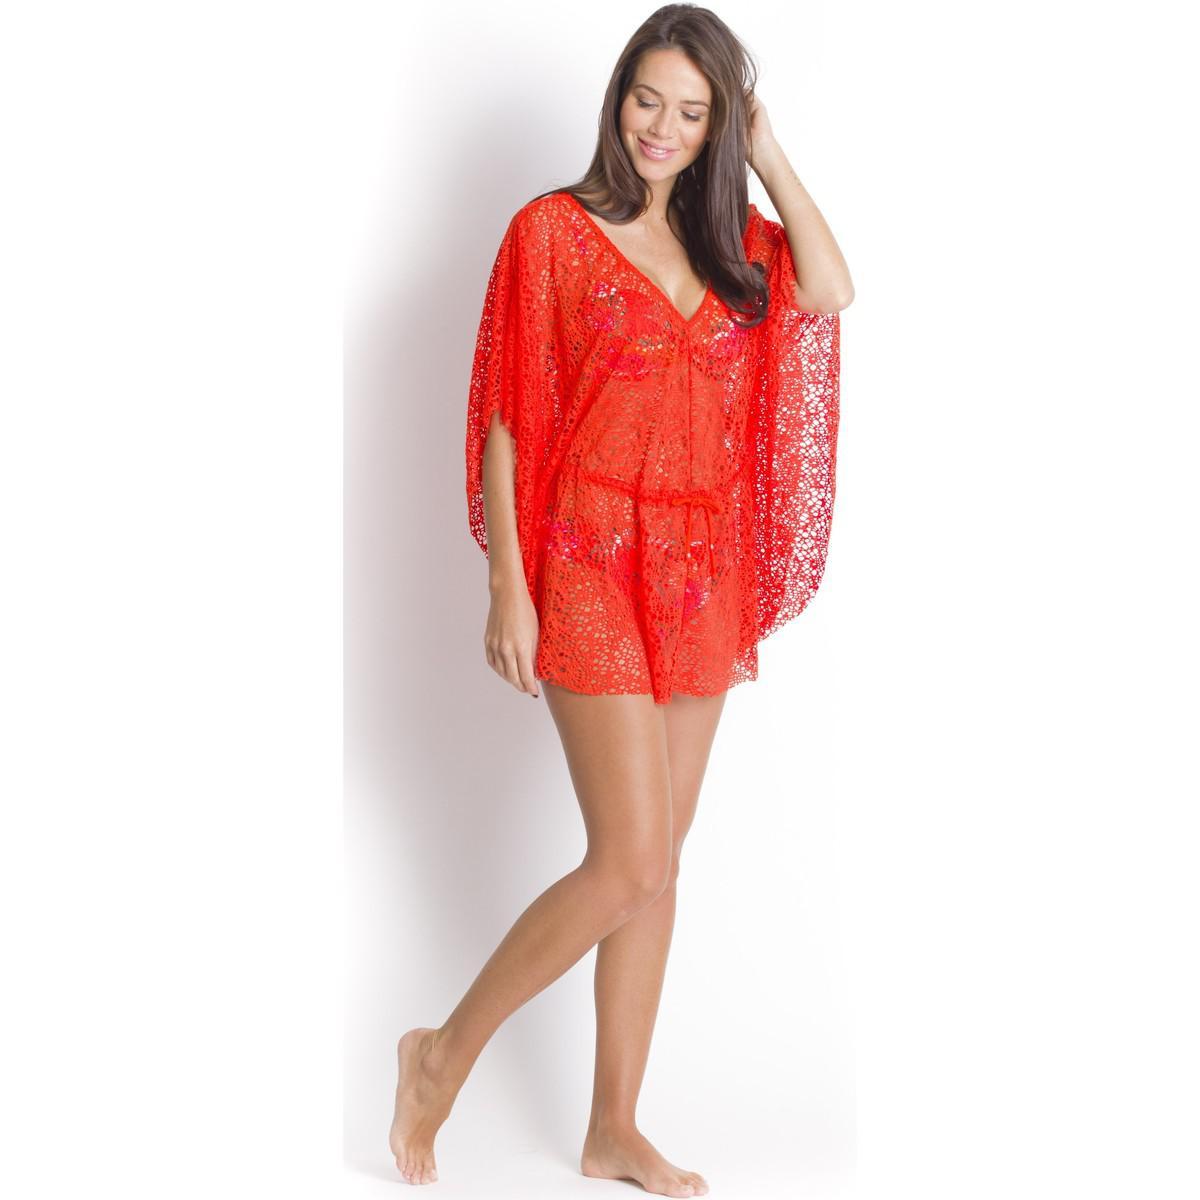 54d04f90c9b54 banana-moon-orange-Cover-up -Orange-Faraday-Seethrough-Womens-Tunic-Dress-In-Orange.jpeg